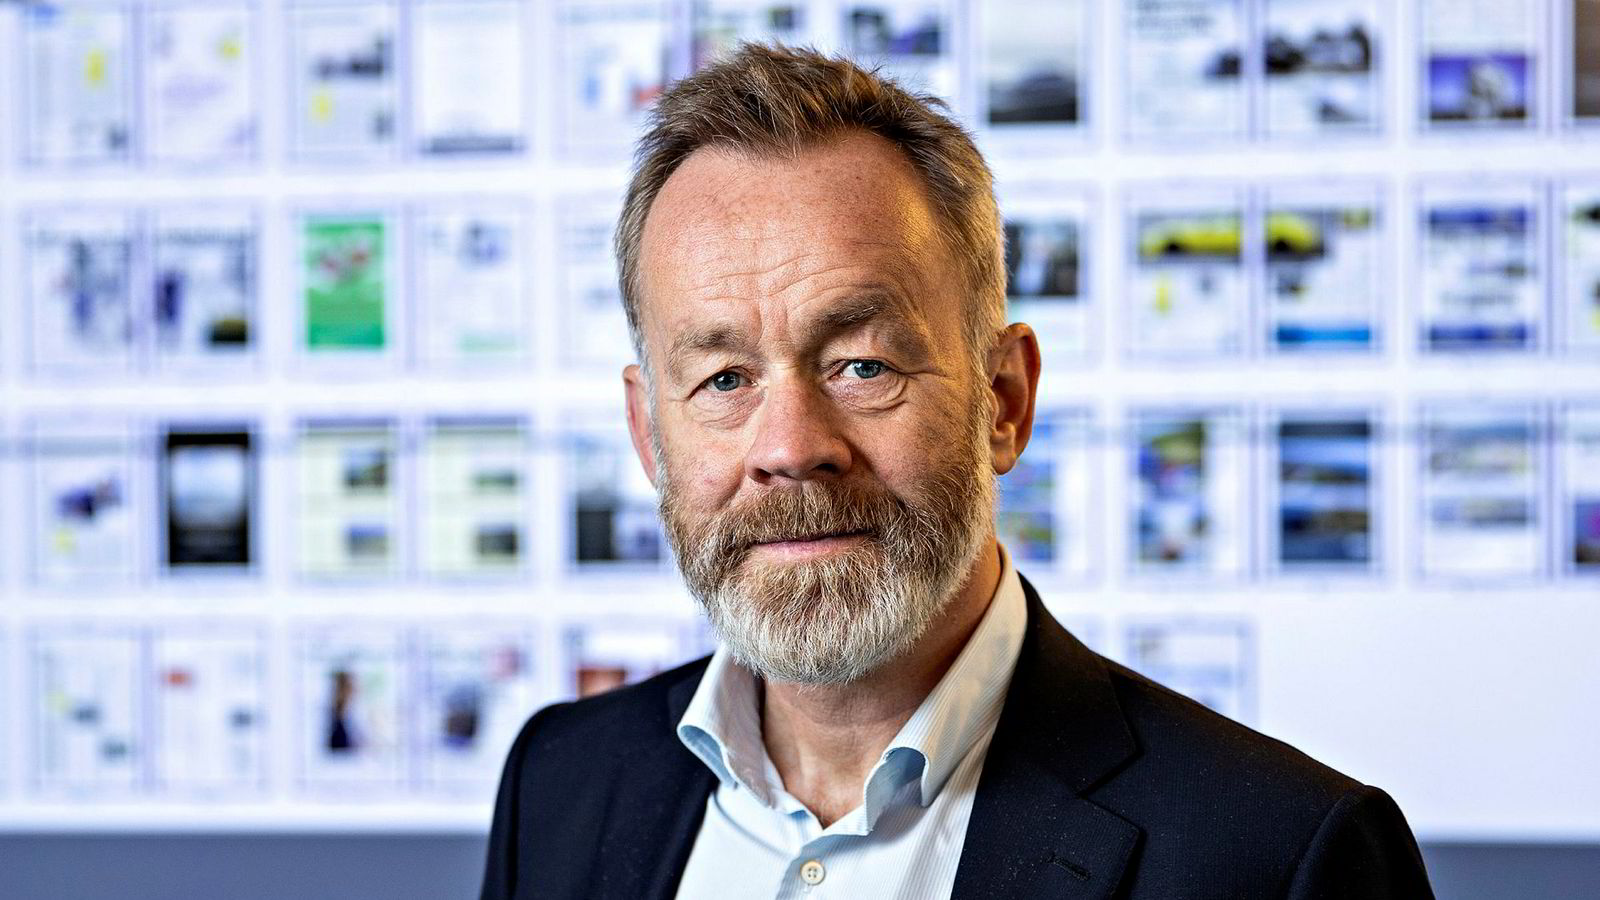 Sjefredaktør og administrerende direktør i Dagens Næringsliv, Amund Djuve.